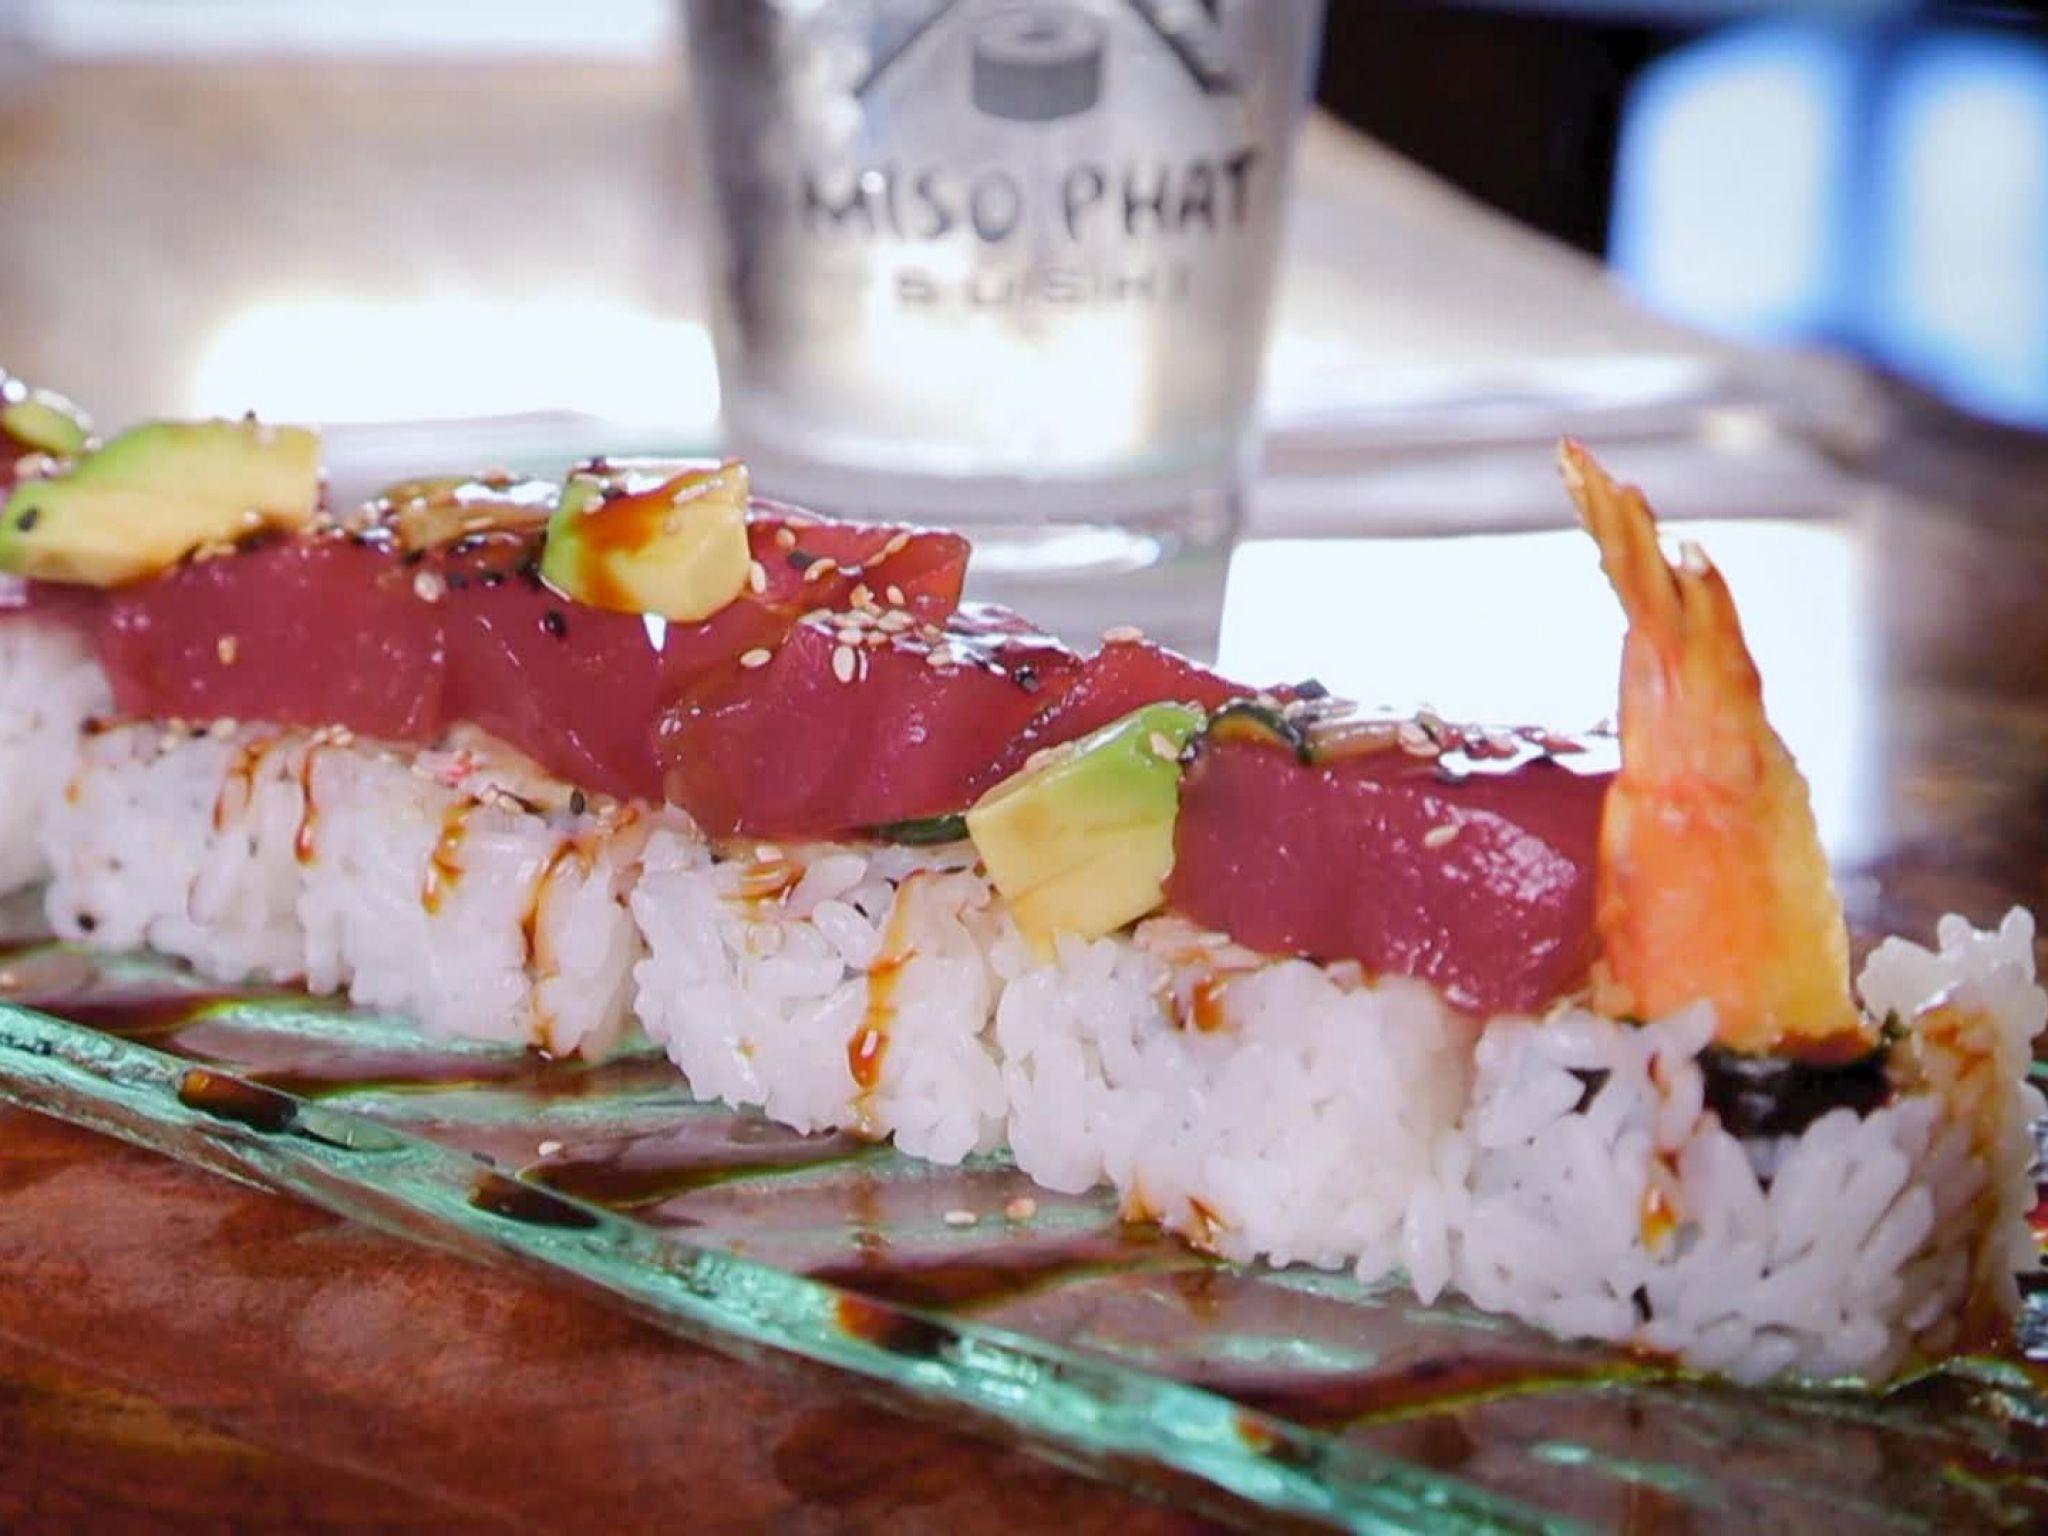 dv2505_miso-phat-sushi_s4x3-jpg-rend-sniipadlarge